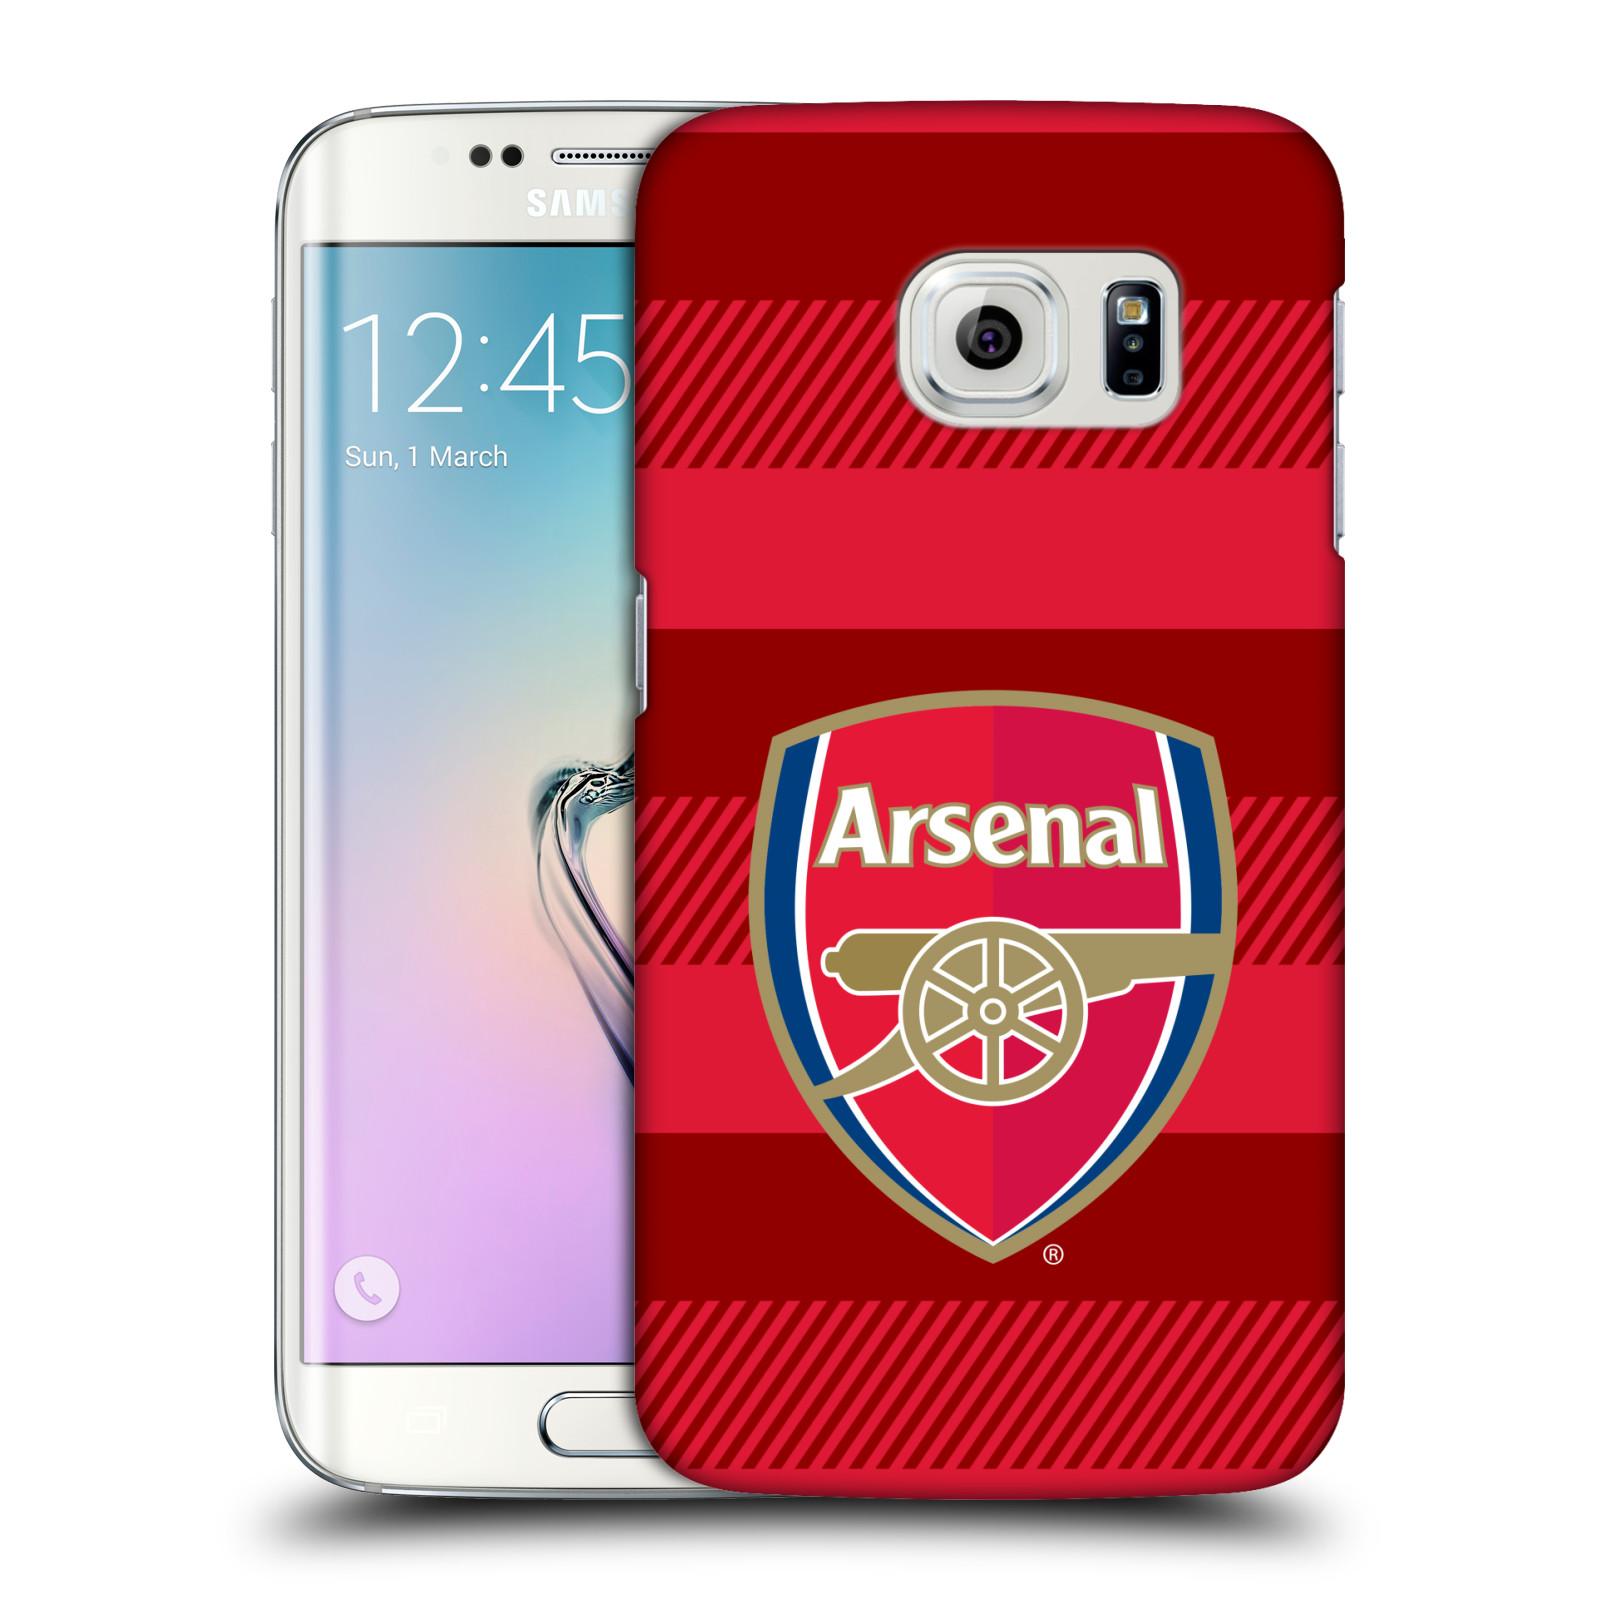 Plastové pouzdro na mobil Samsung Galaxy S6 Edge - Head Case - Arsenal FC - Logo s pruhy